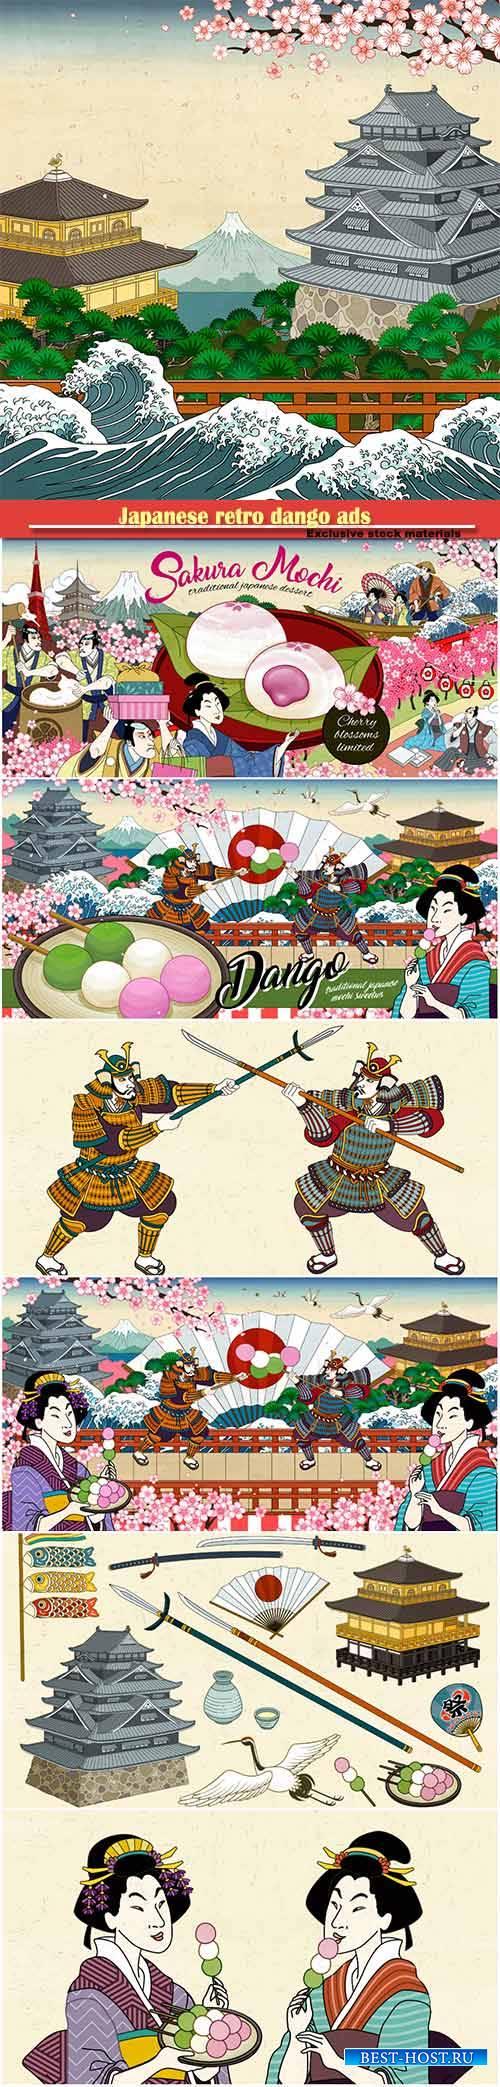 Japanese retro dango ads, cultural symbols, historical landmarks